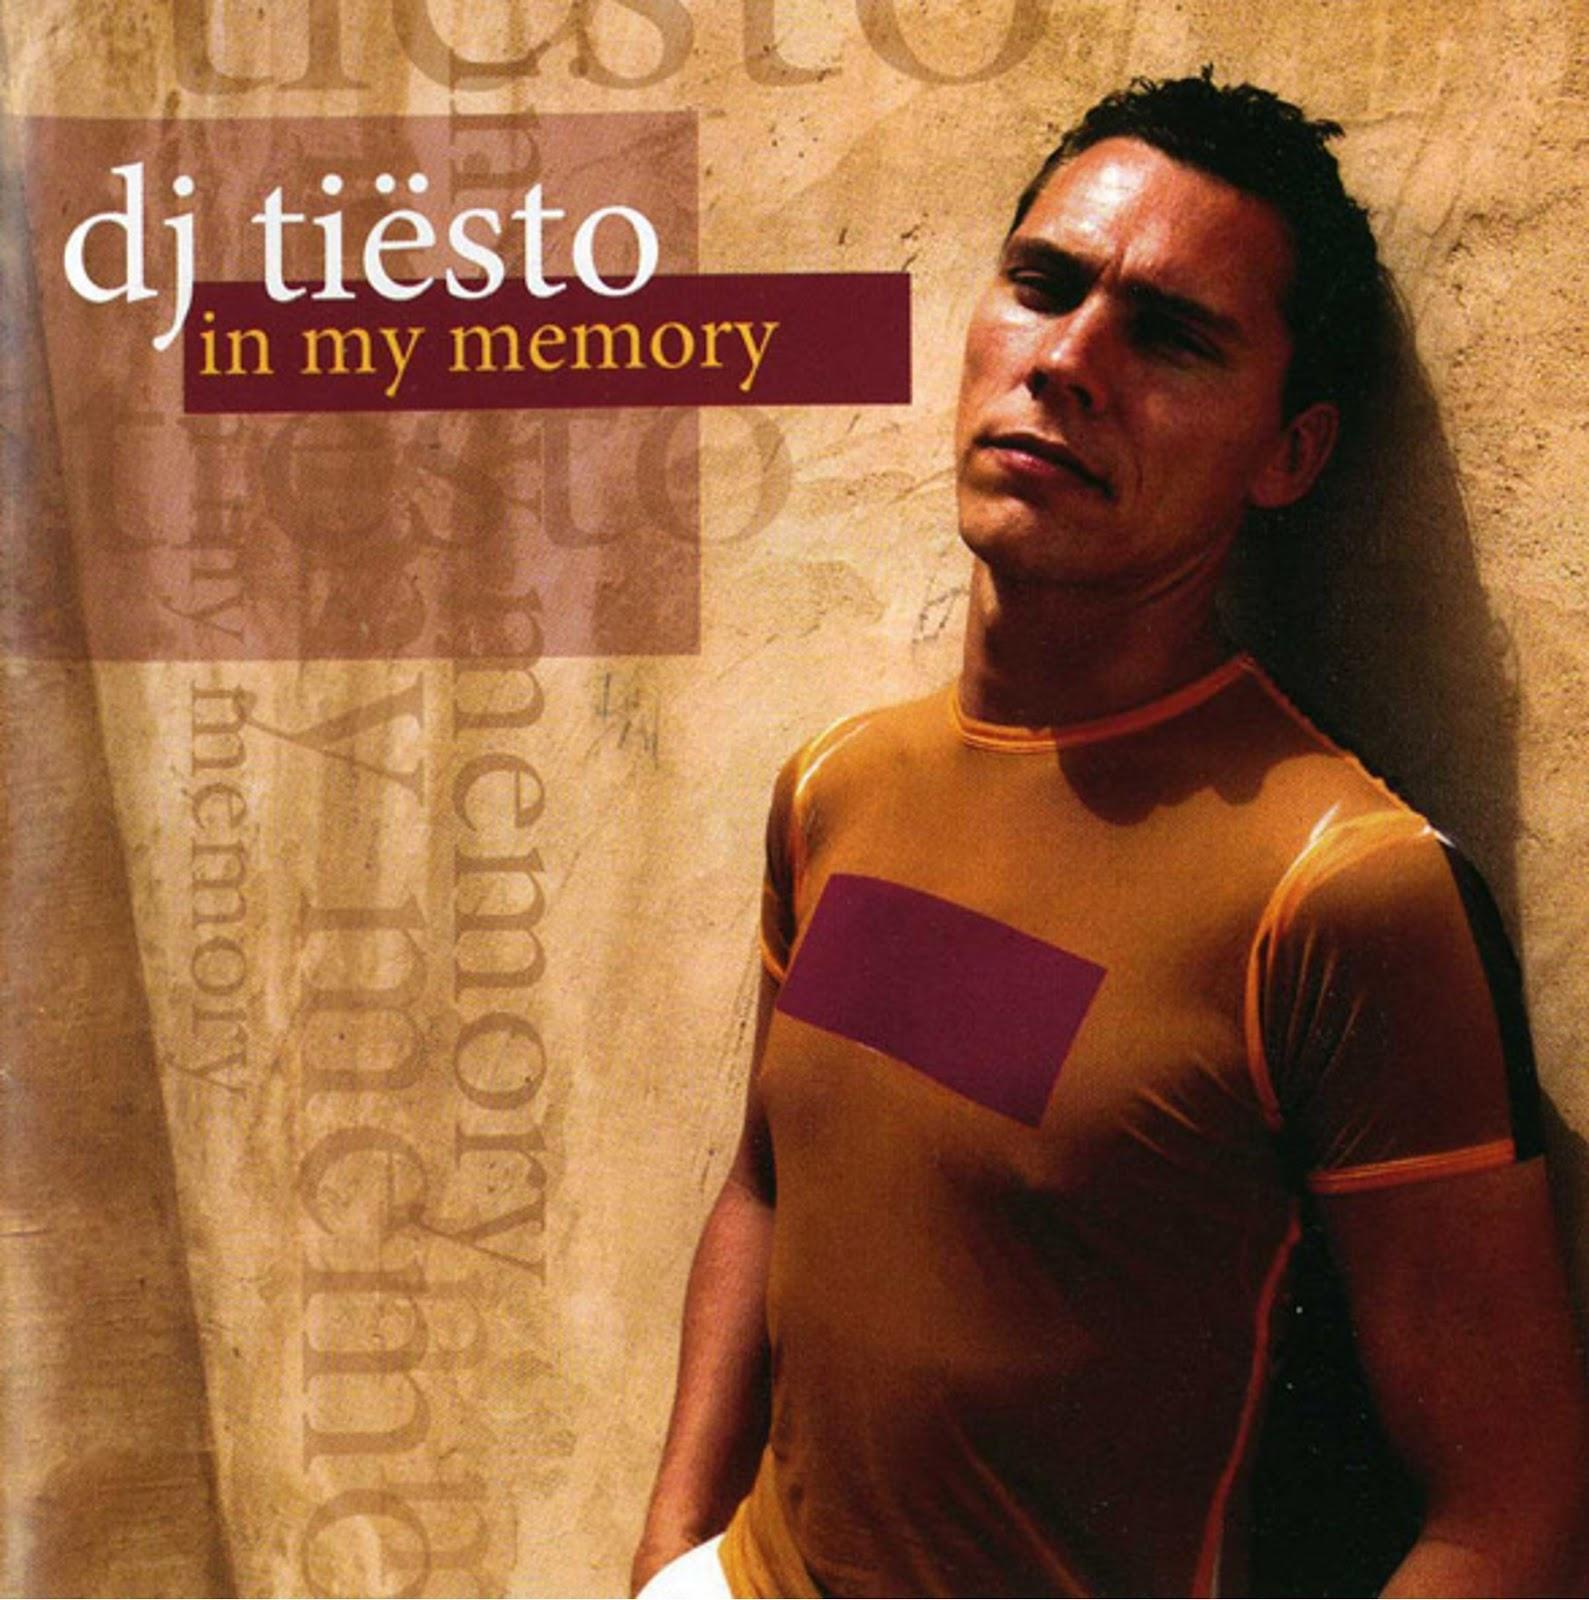 DJ Tiesto* - Mp3 Collection - Discogs